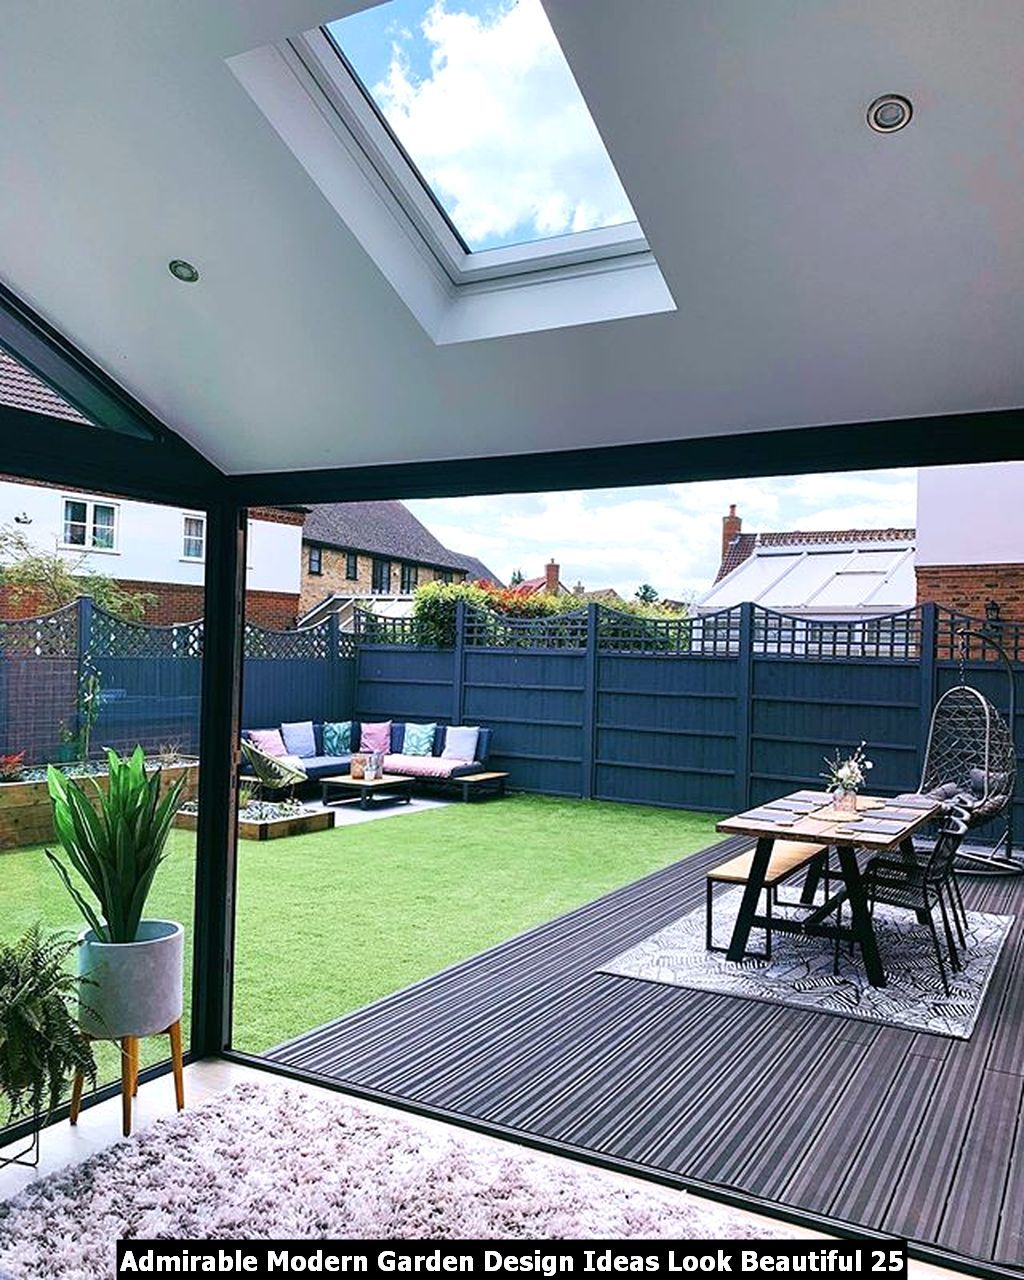 Admirable Modern Garden Design Ideas Look Beautiful Pimphomee Backyard Renovations Garden Room Extensions Back Garden Design